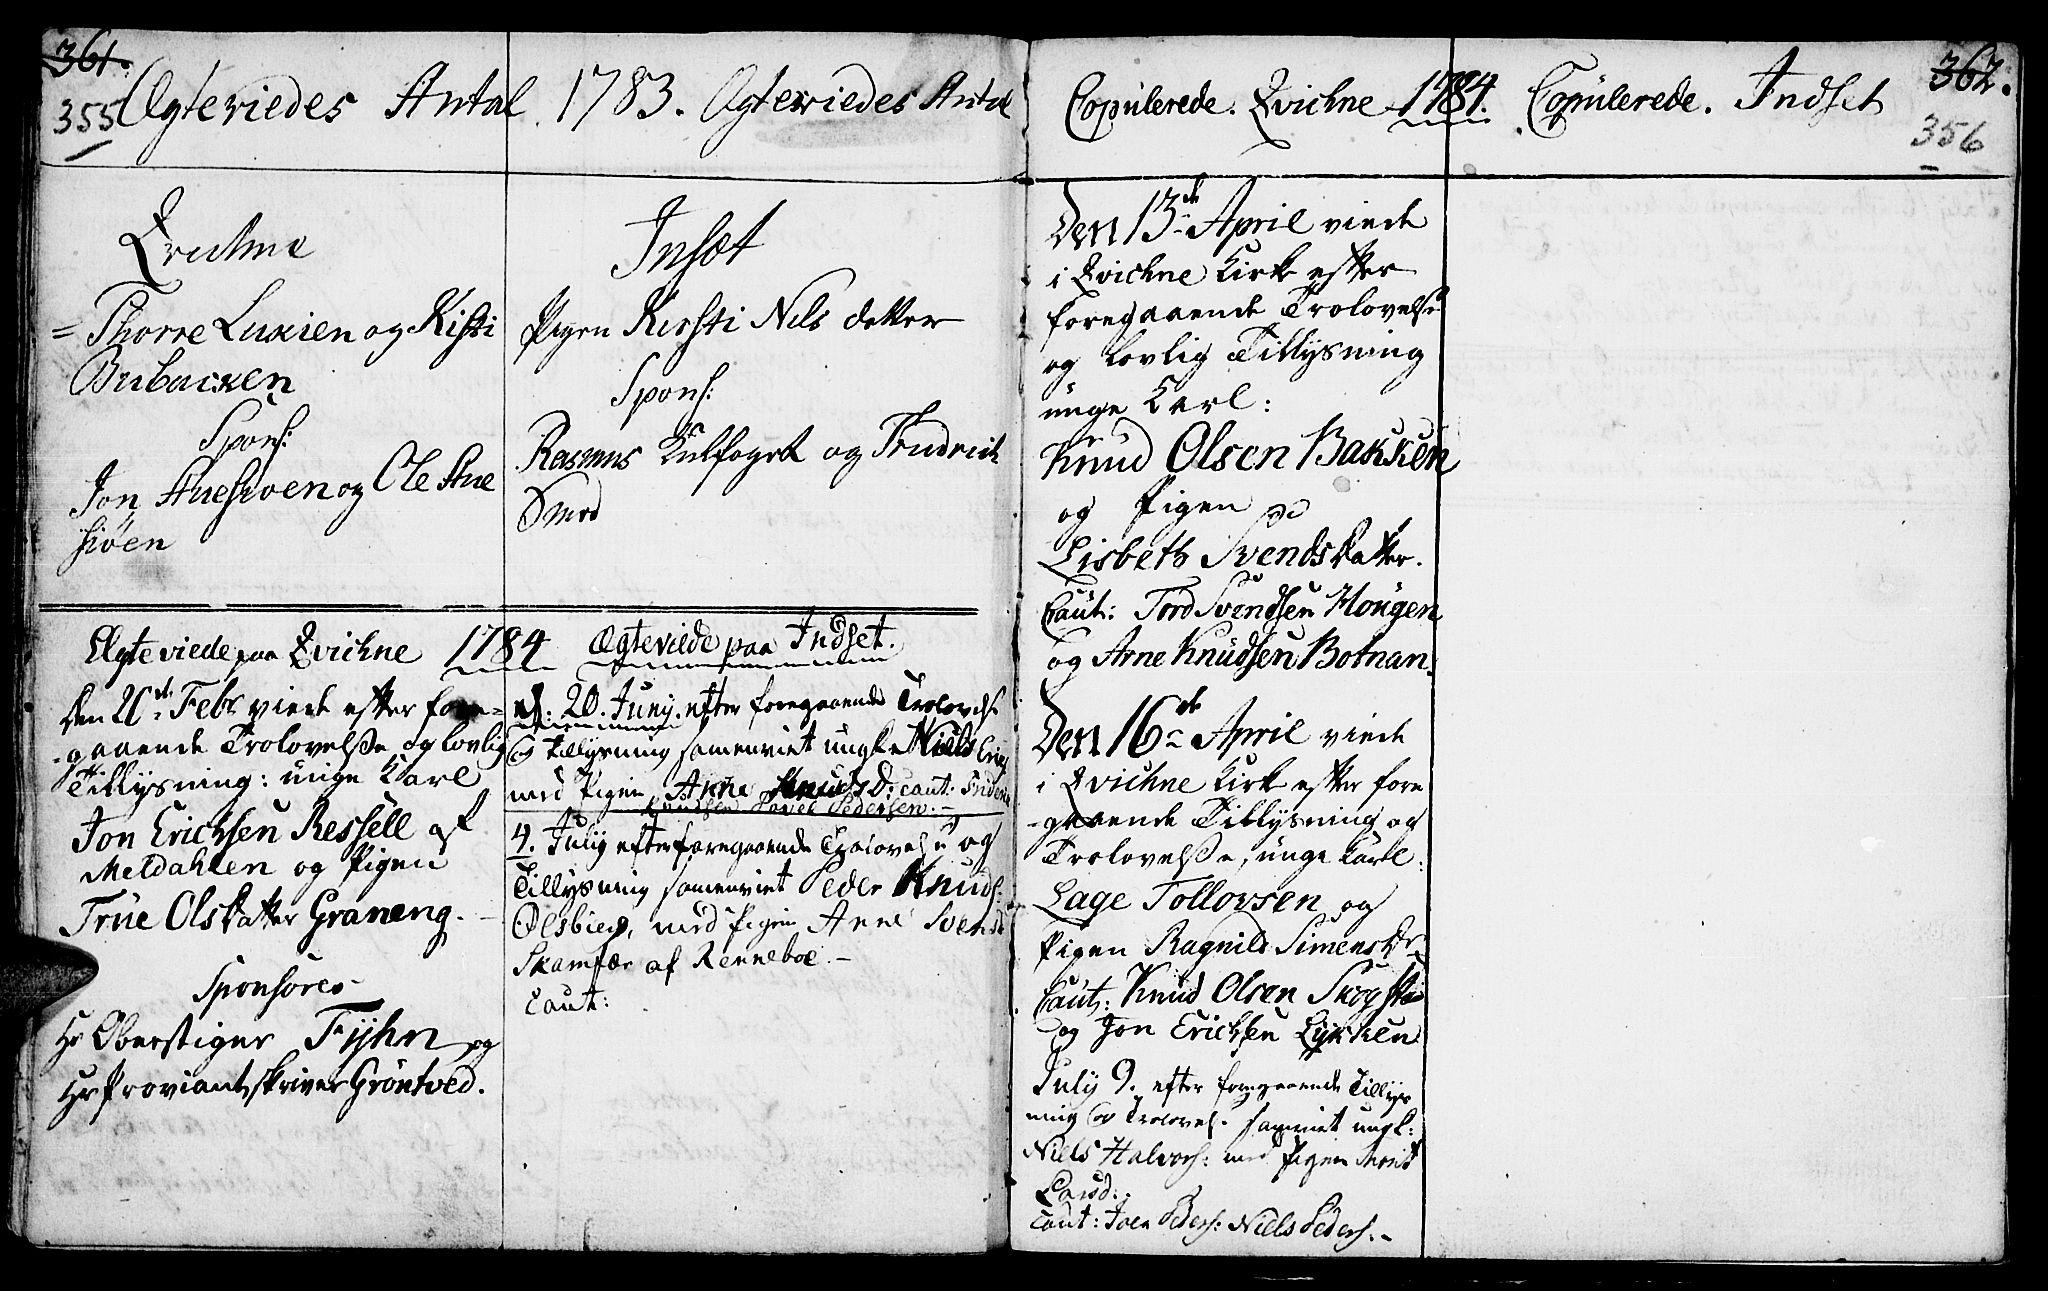 SAH, Kvikne prestekontor, Ministerialbok nr. 2, 1764-1784, s. 355-356